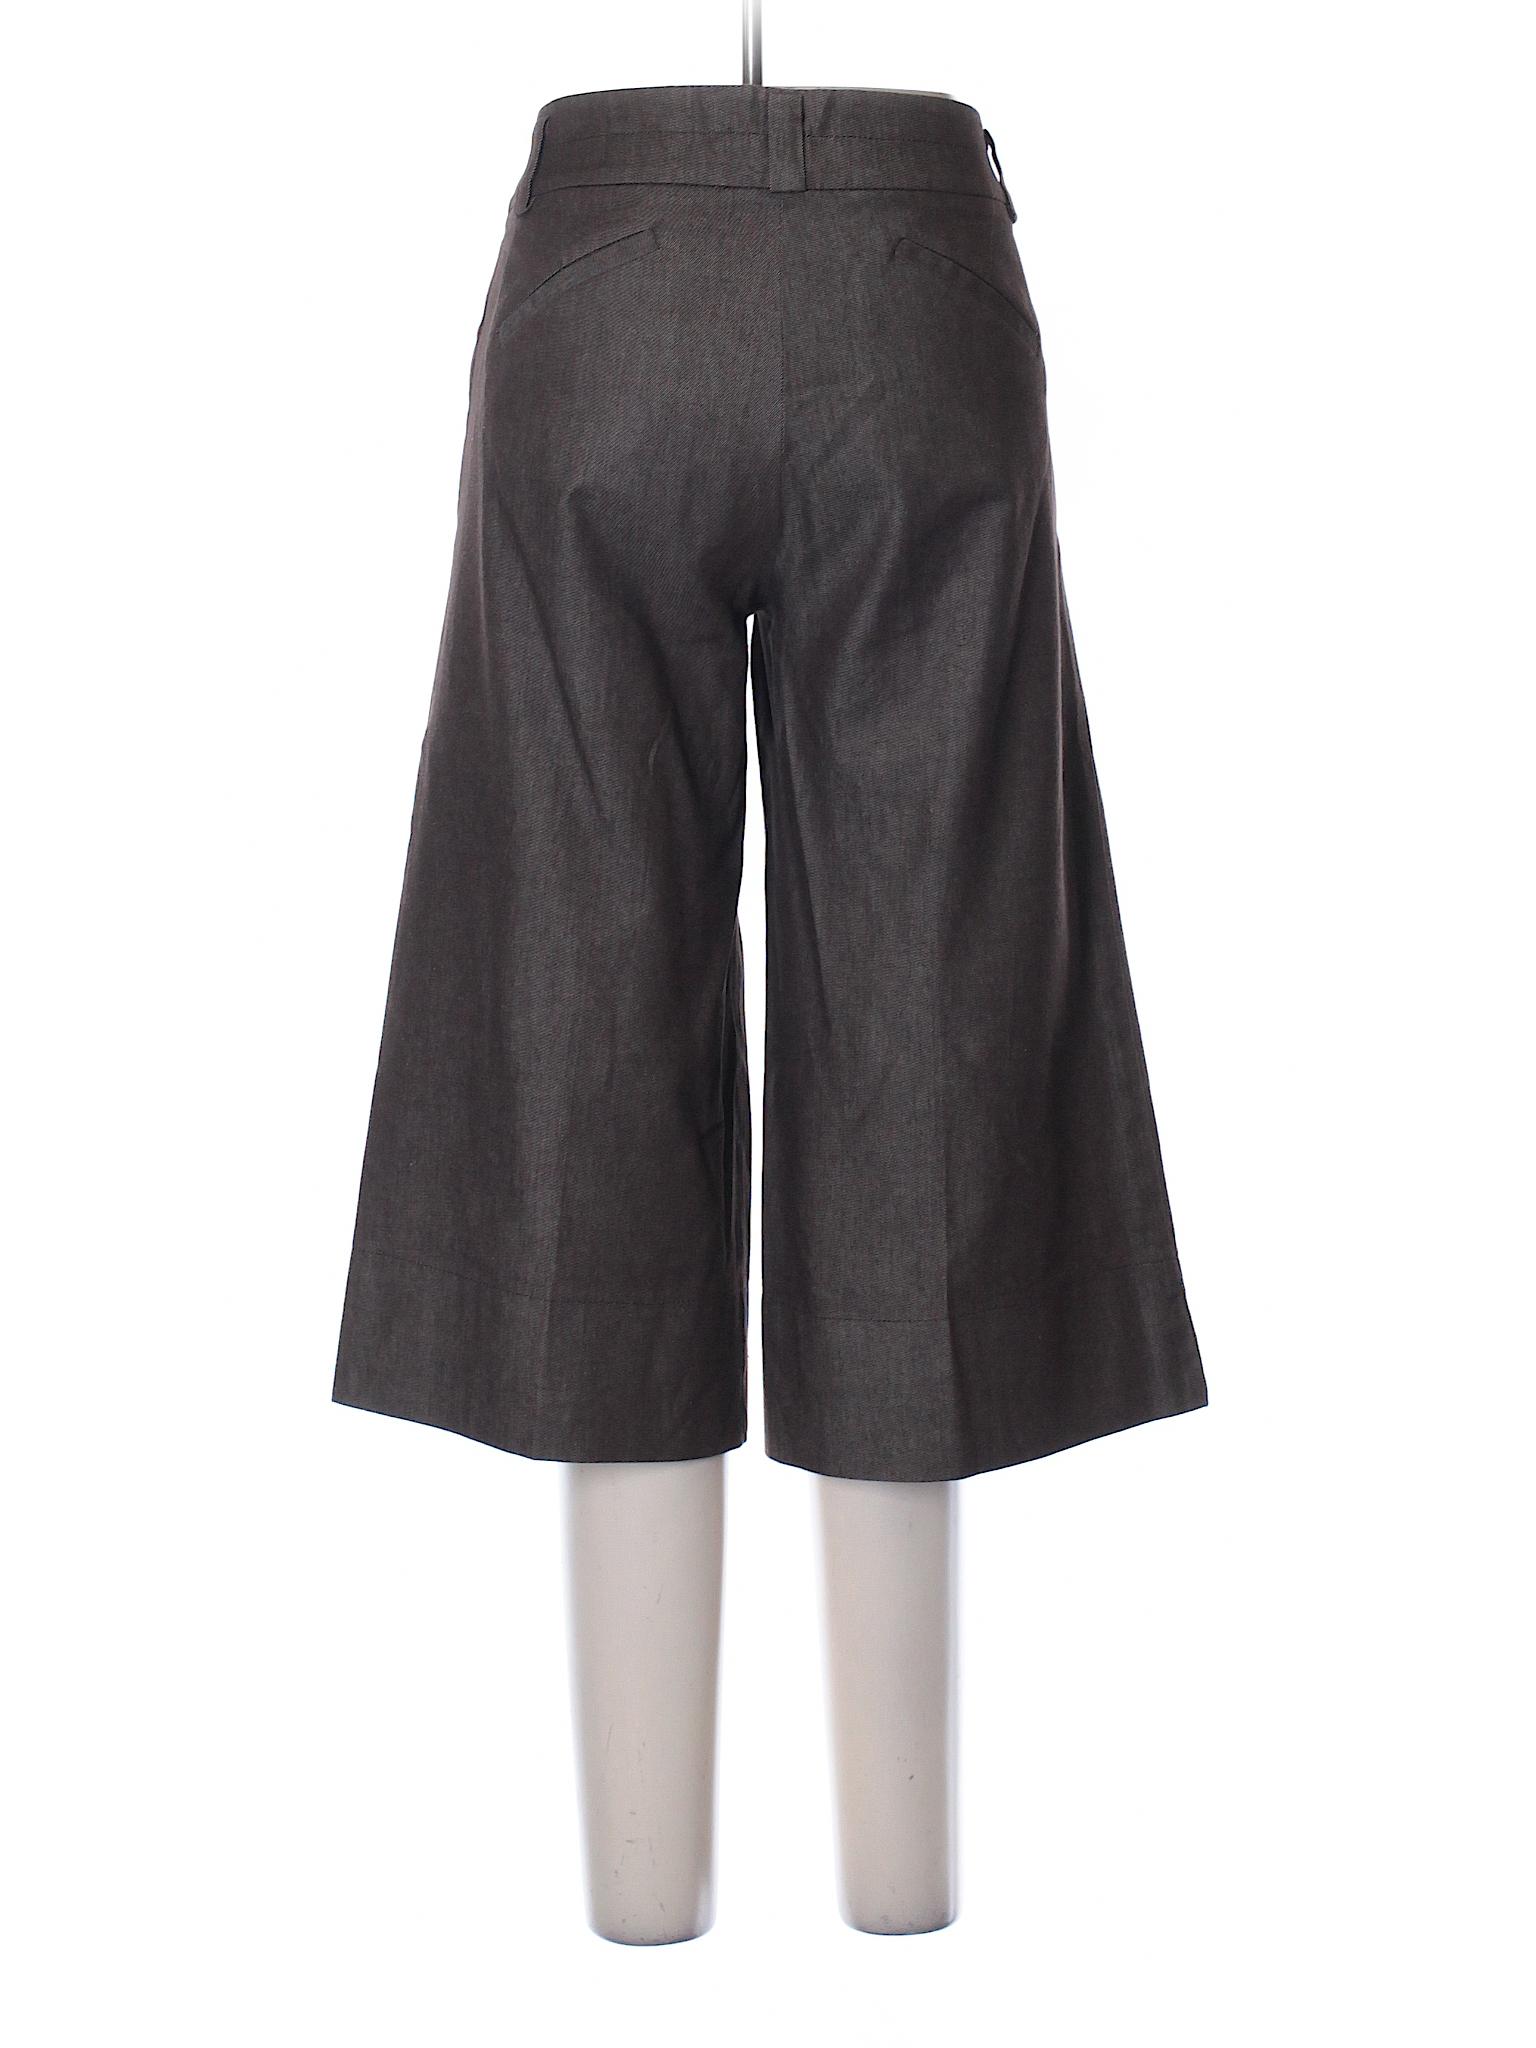 Boutique Trina Turk Pants winter Dress rTx5XErq